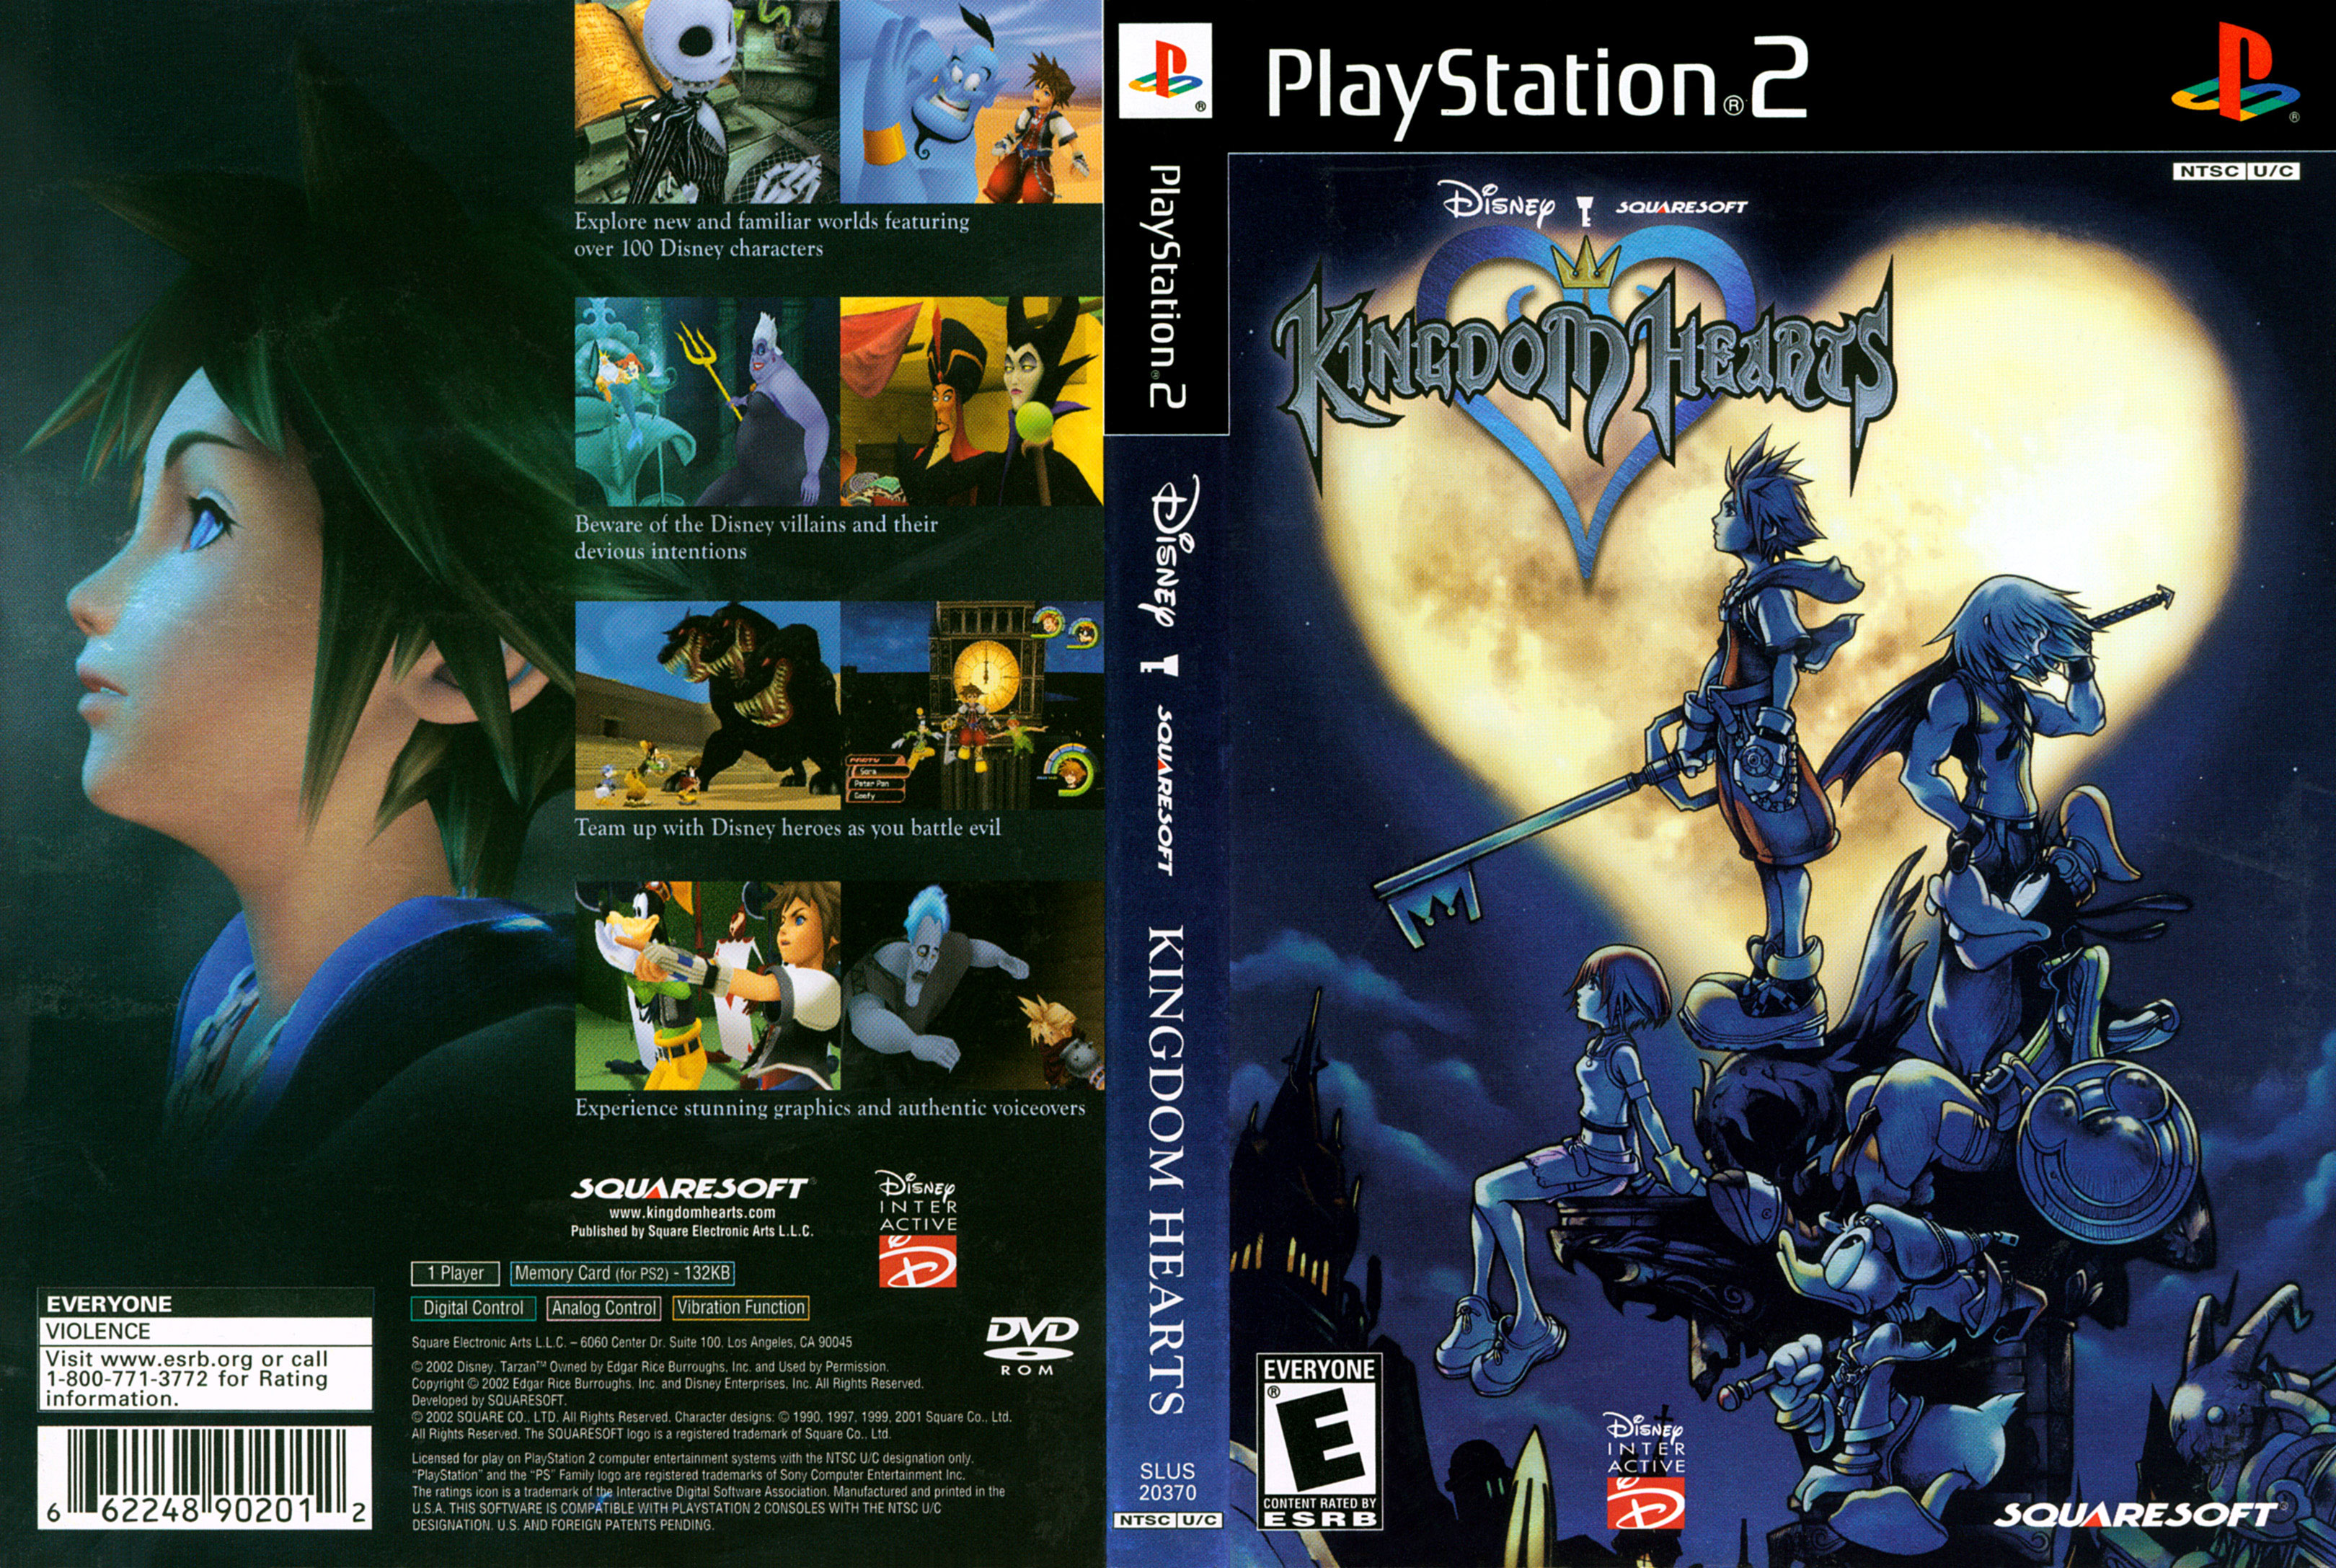 Kingdom Hearts - Kingdom Hearts Ultimania